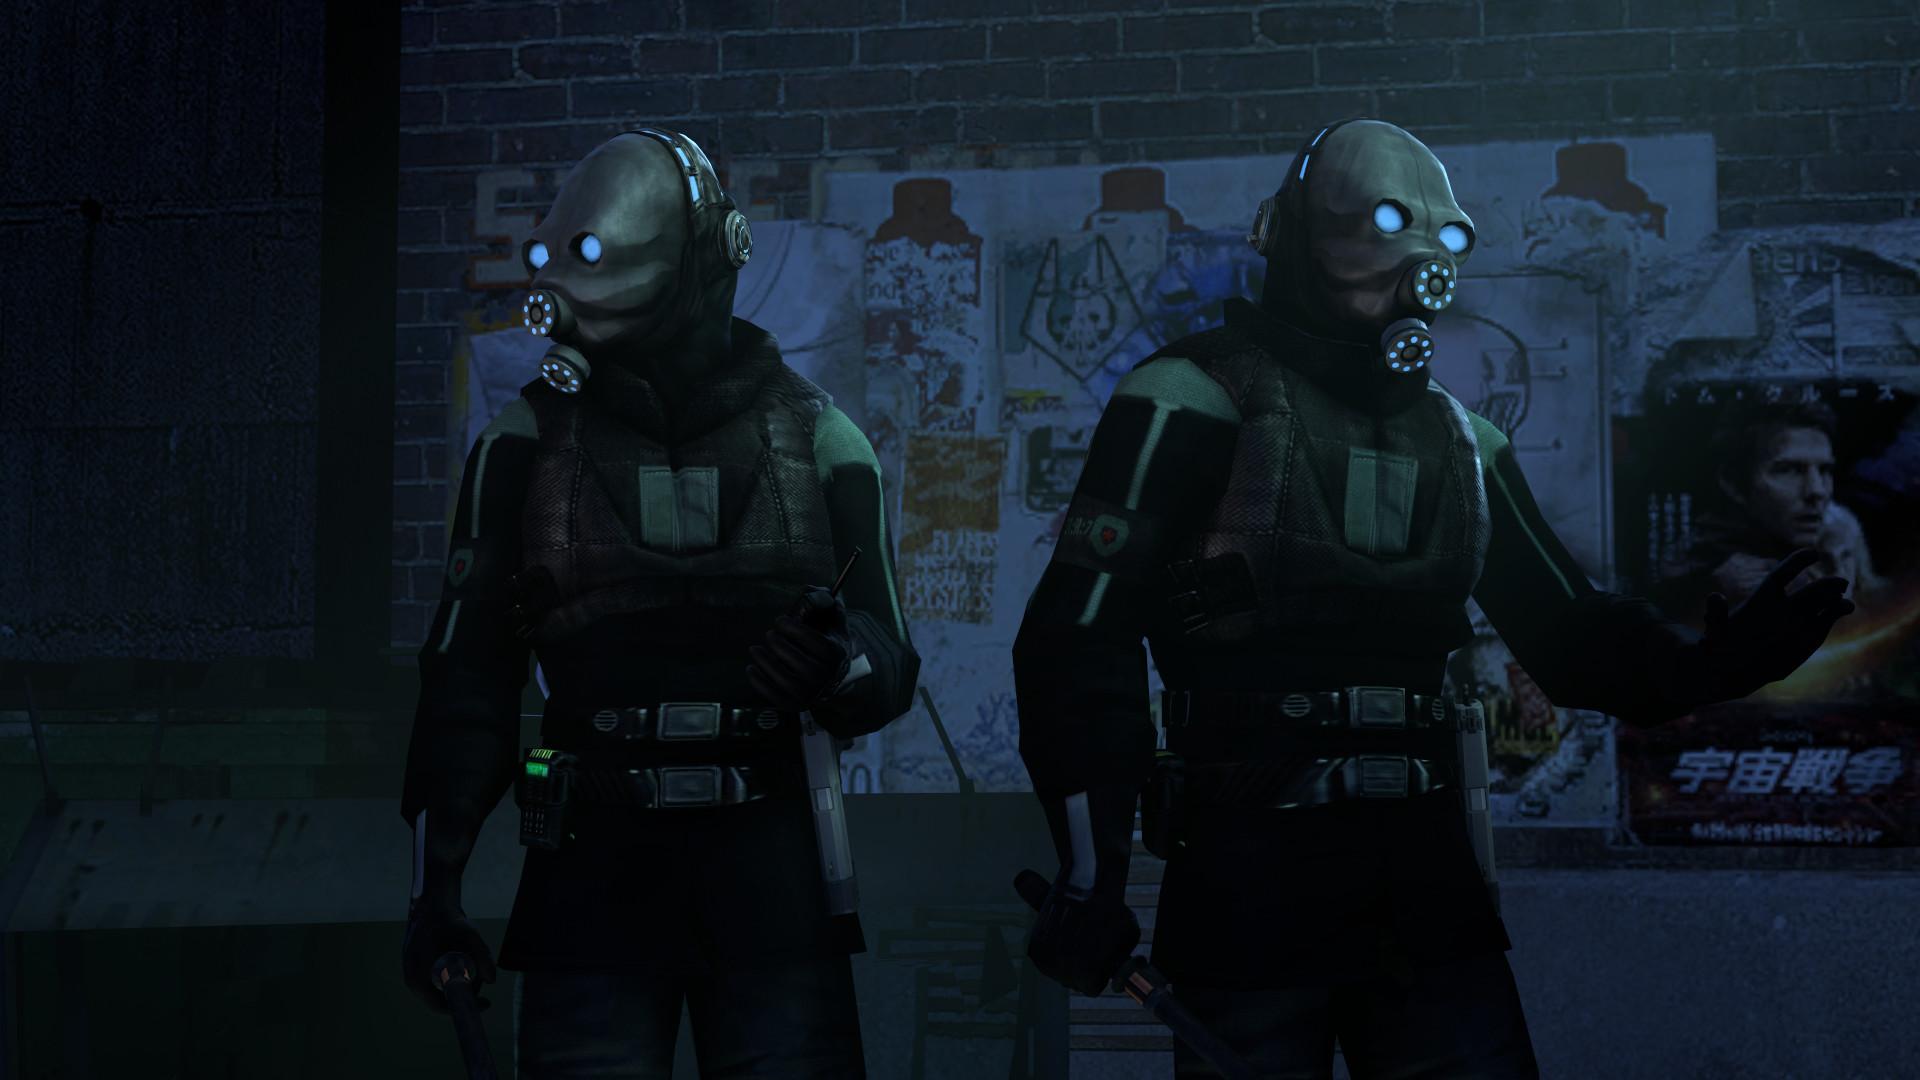 Paul meyer city 8 s civil protection team units